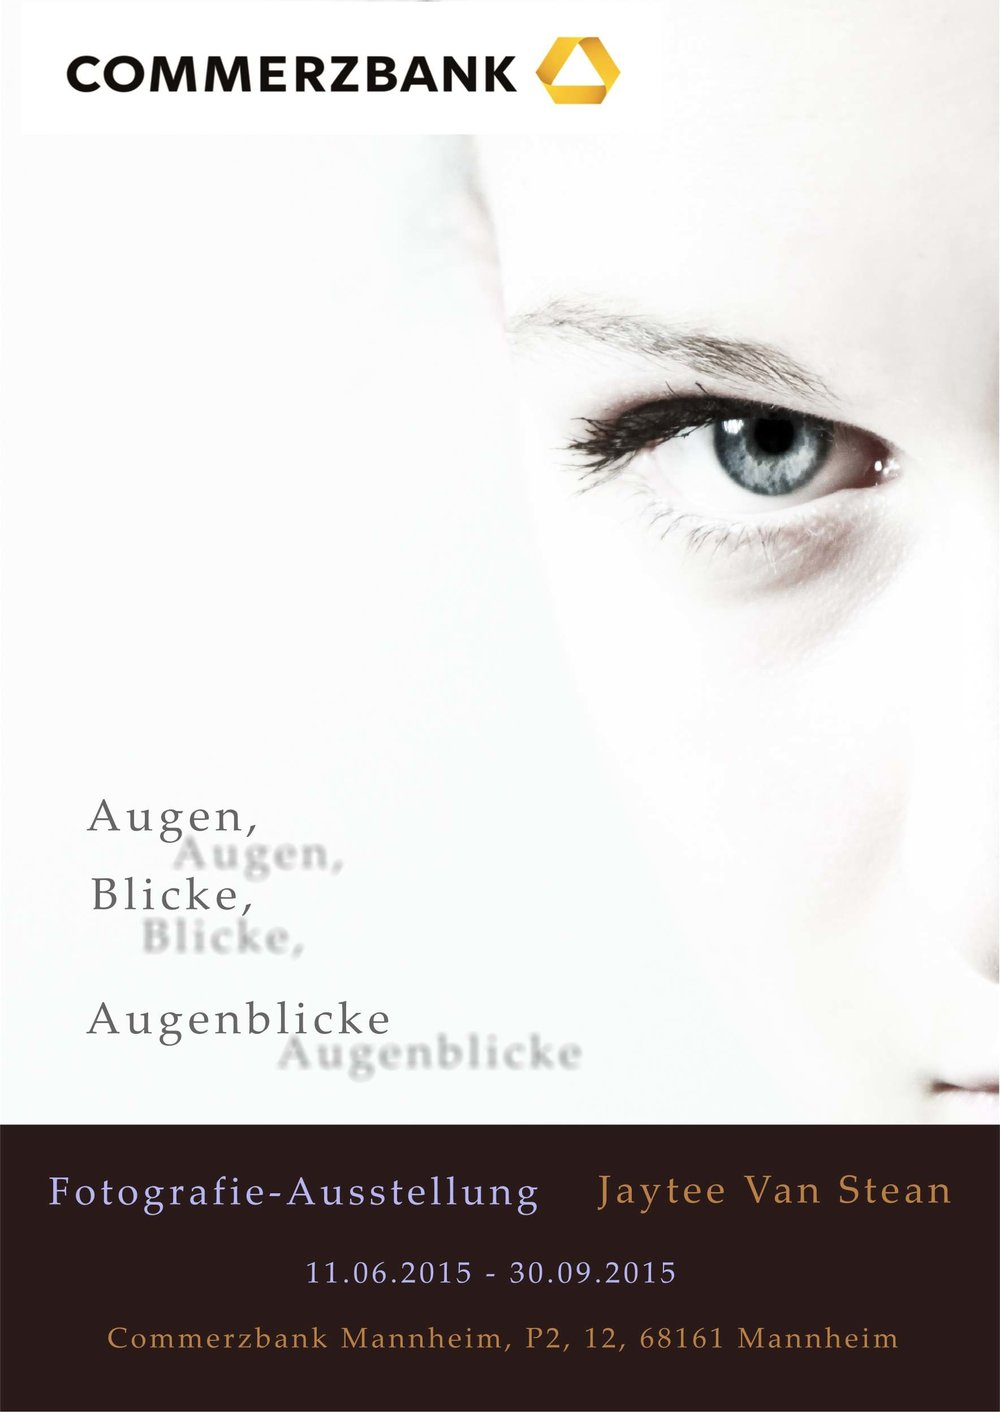 Plakat Fotografieausstellung Jaytee Van Stean fotostudio fotoinitiative grösser.jpg